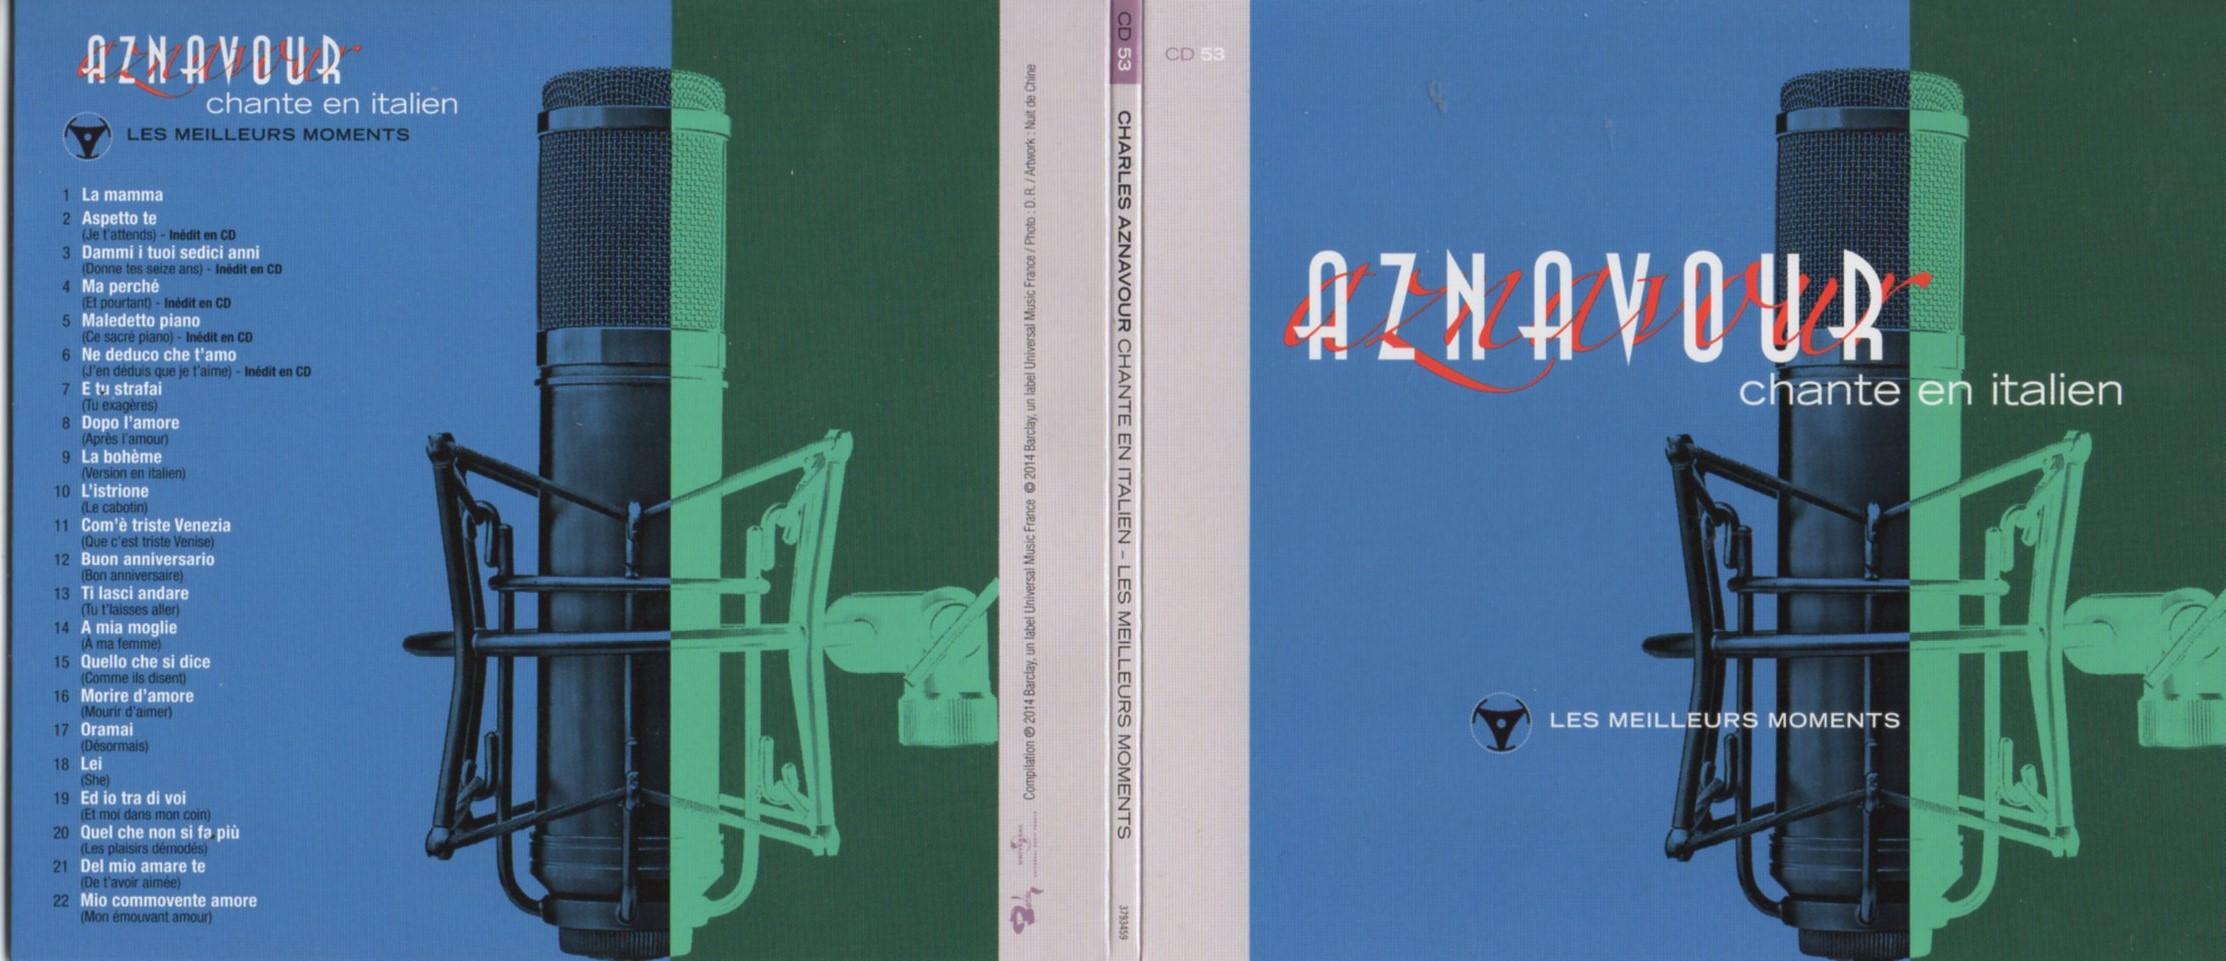 CHARLES AZNAVOUR - Chante en Italien - Canta in Italiano - Les meilleurs moments Gatefold Card board sleeve - CD